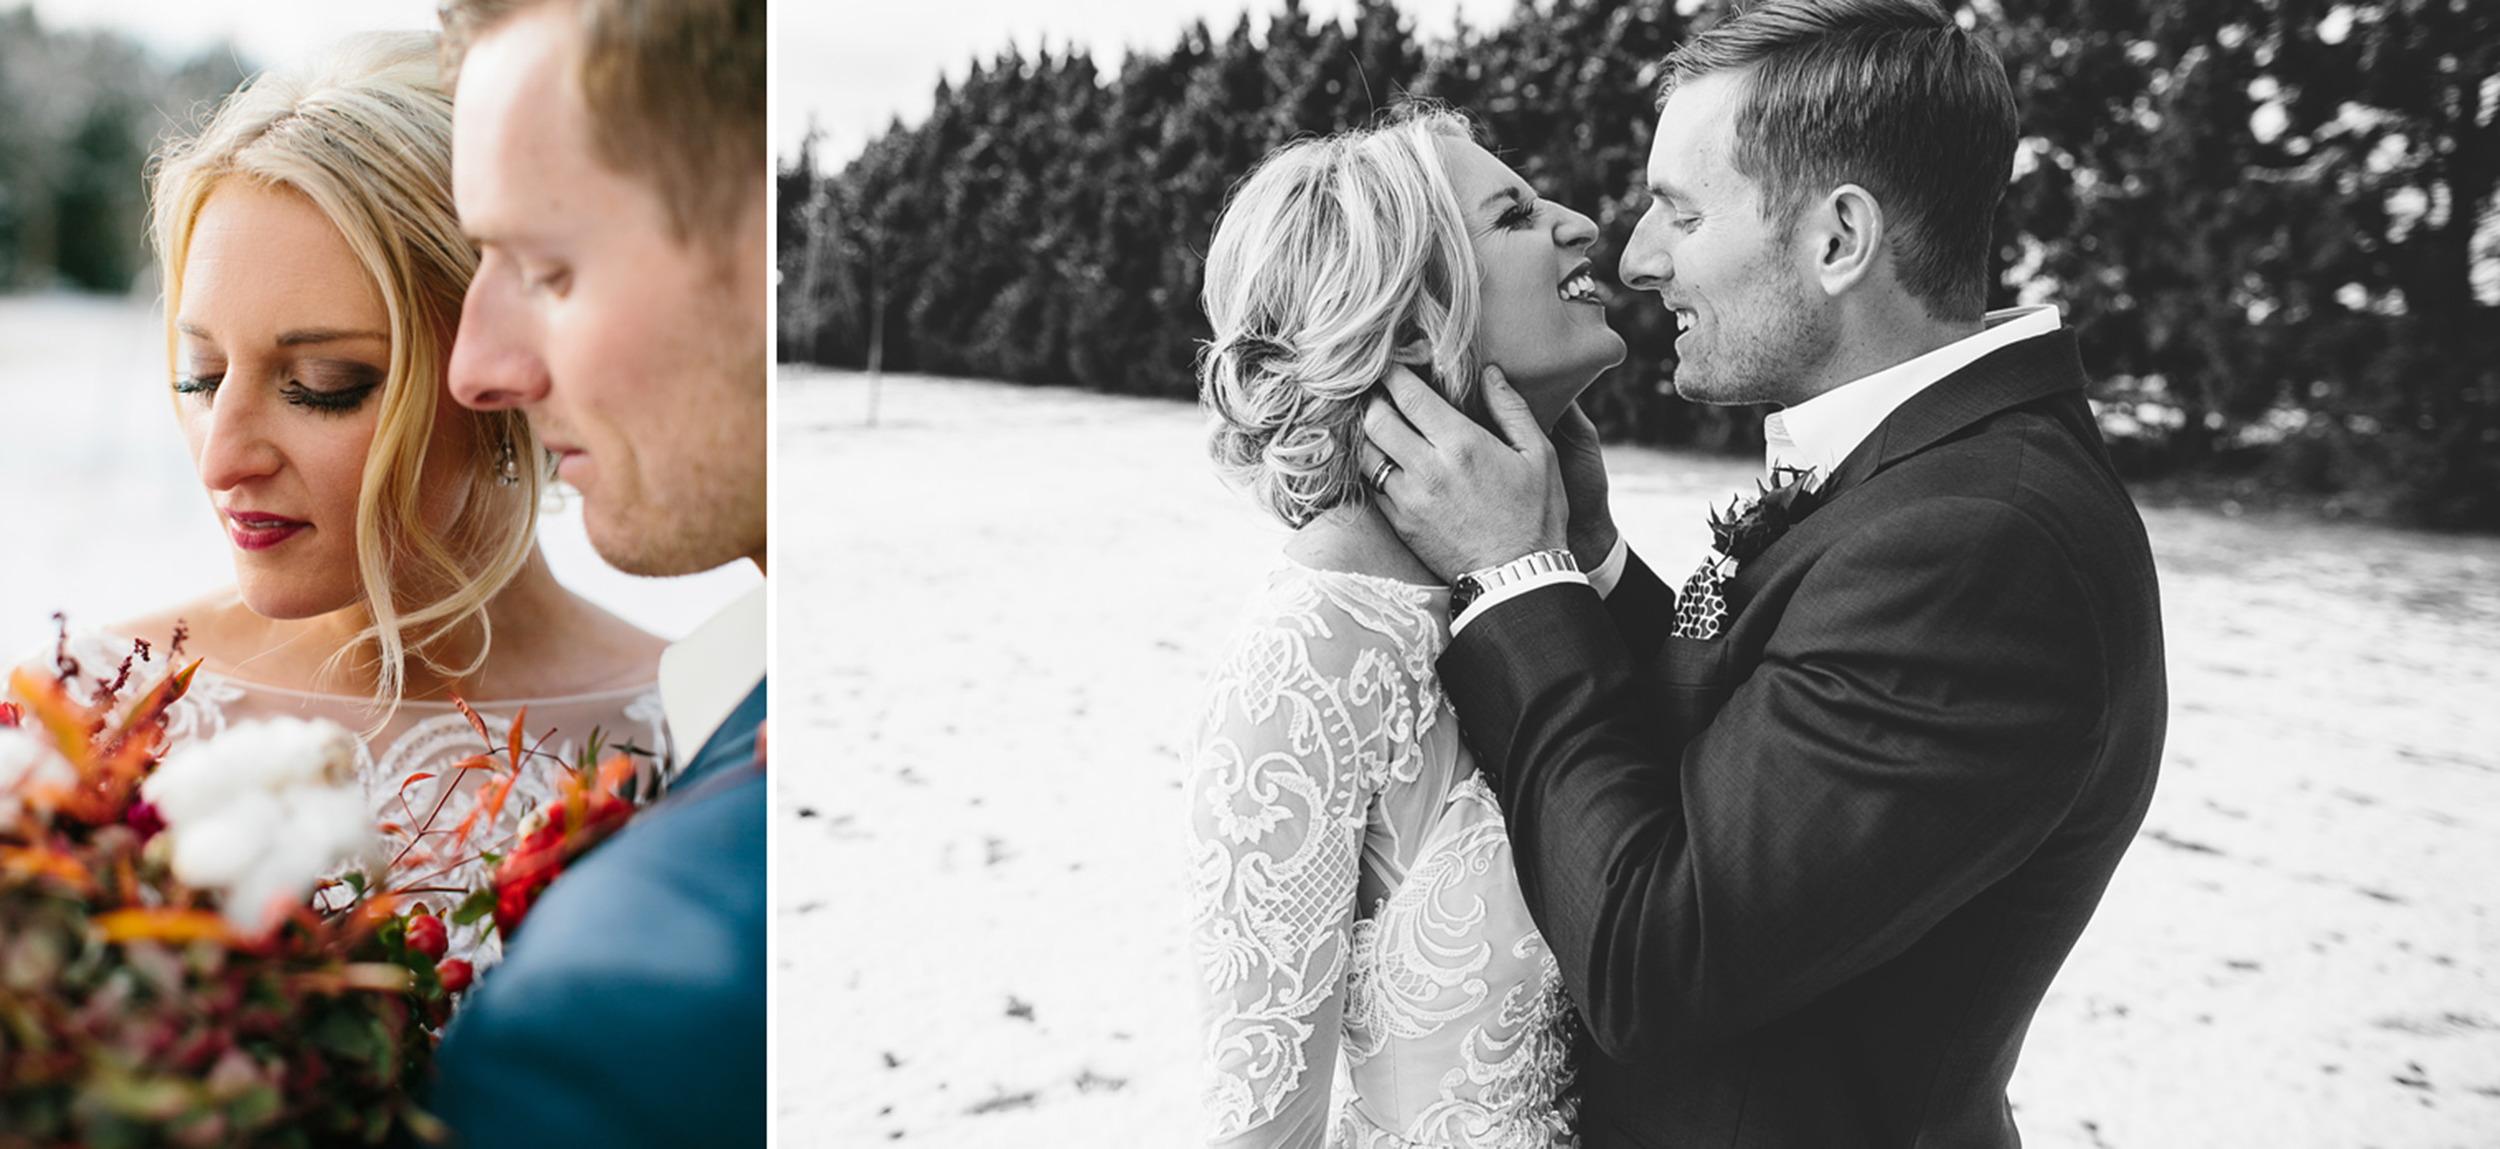 Cotton_Creek_Barn_Winter_Wedding_WeddingPhotographer028.jpg